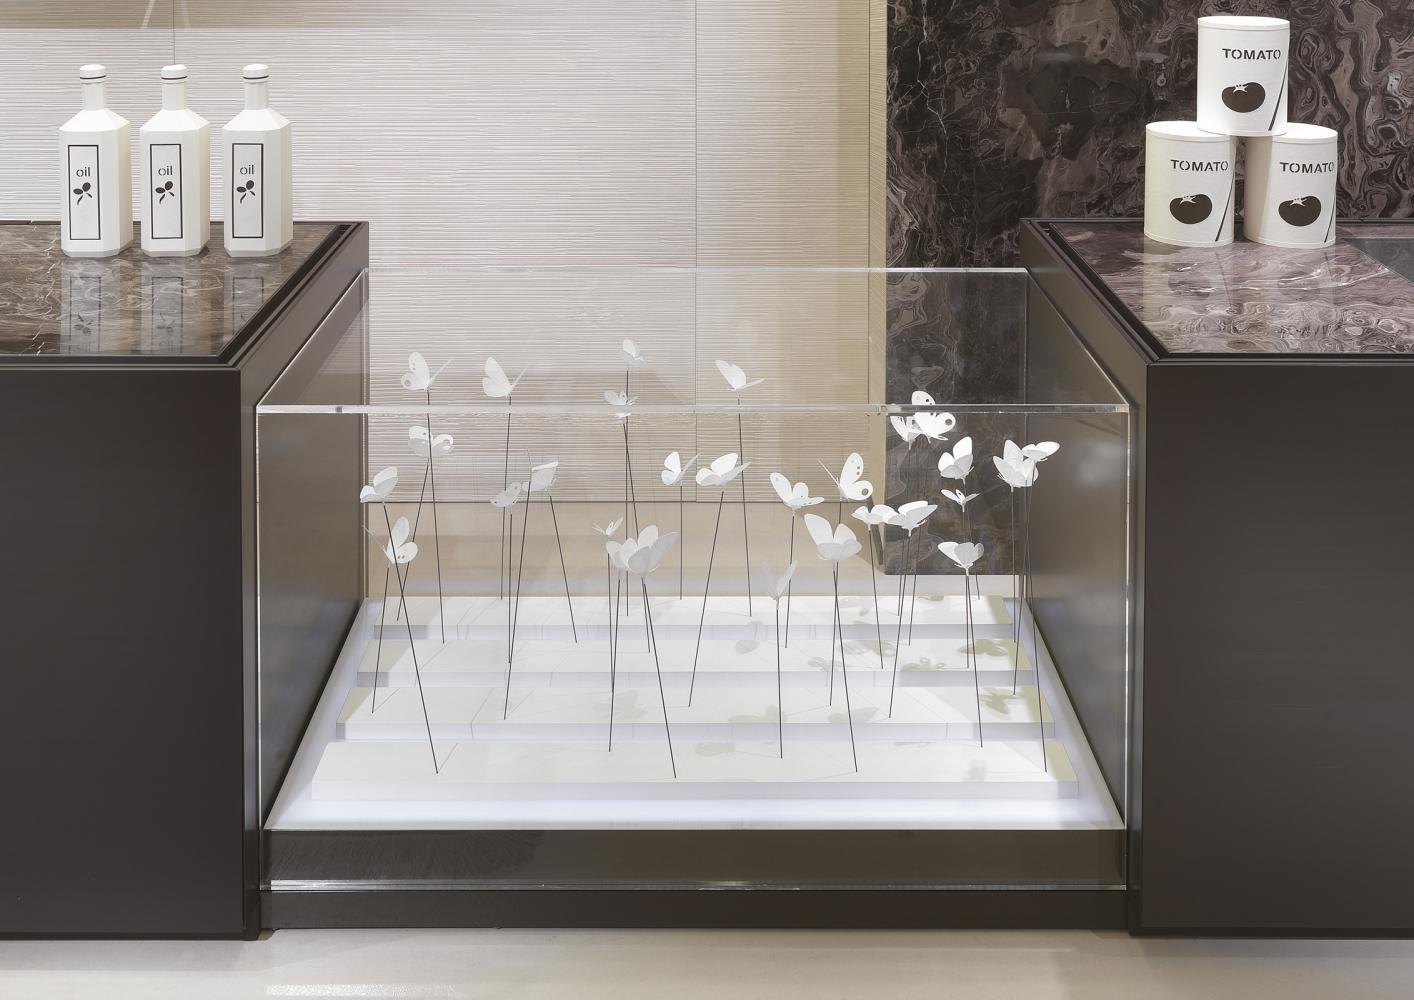 Laurameroni luxury modern made to measure bespoke modular kitchen for contemporary interior decor and design